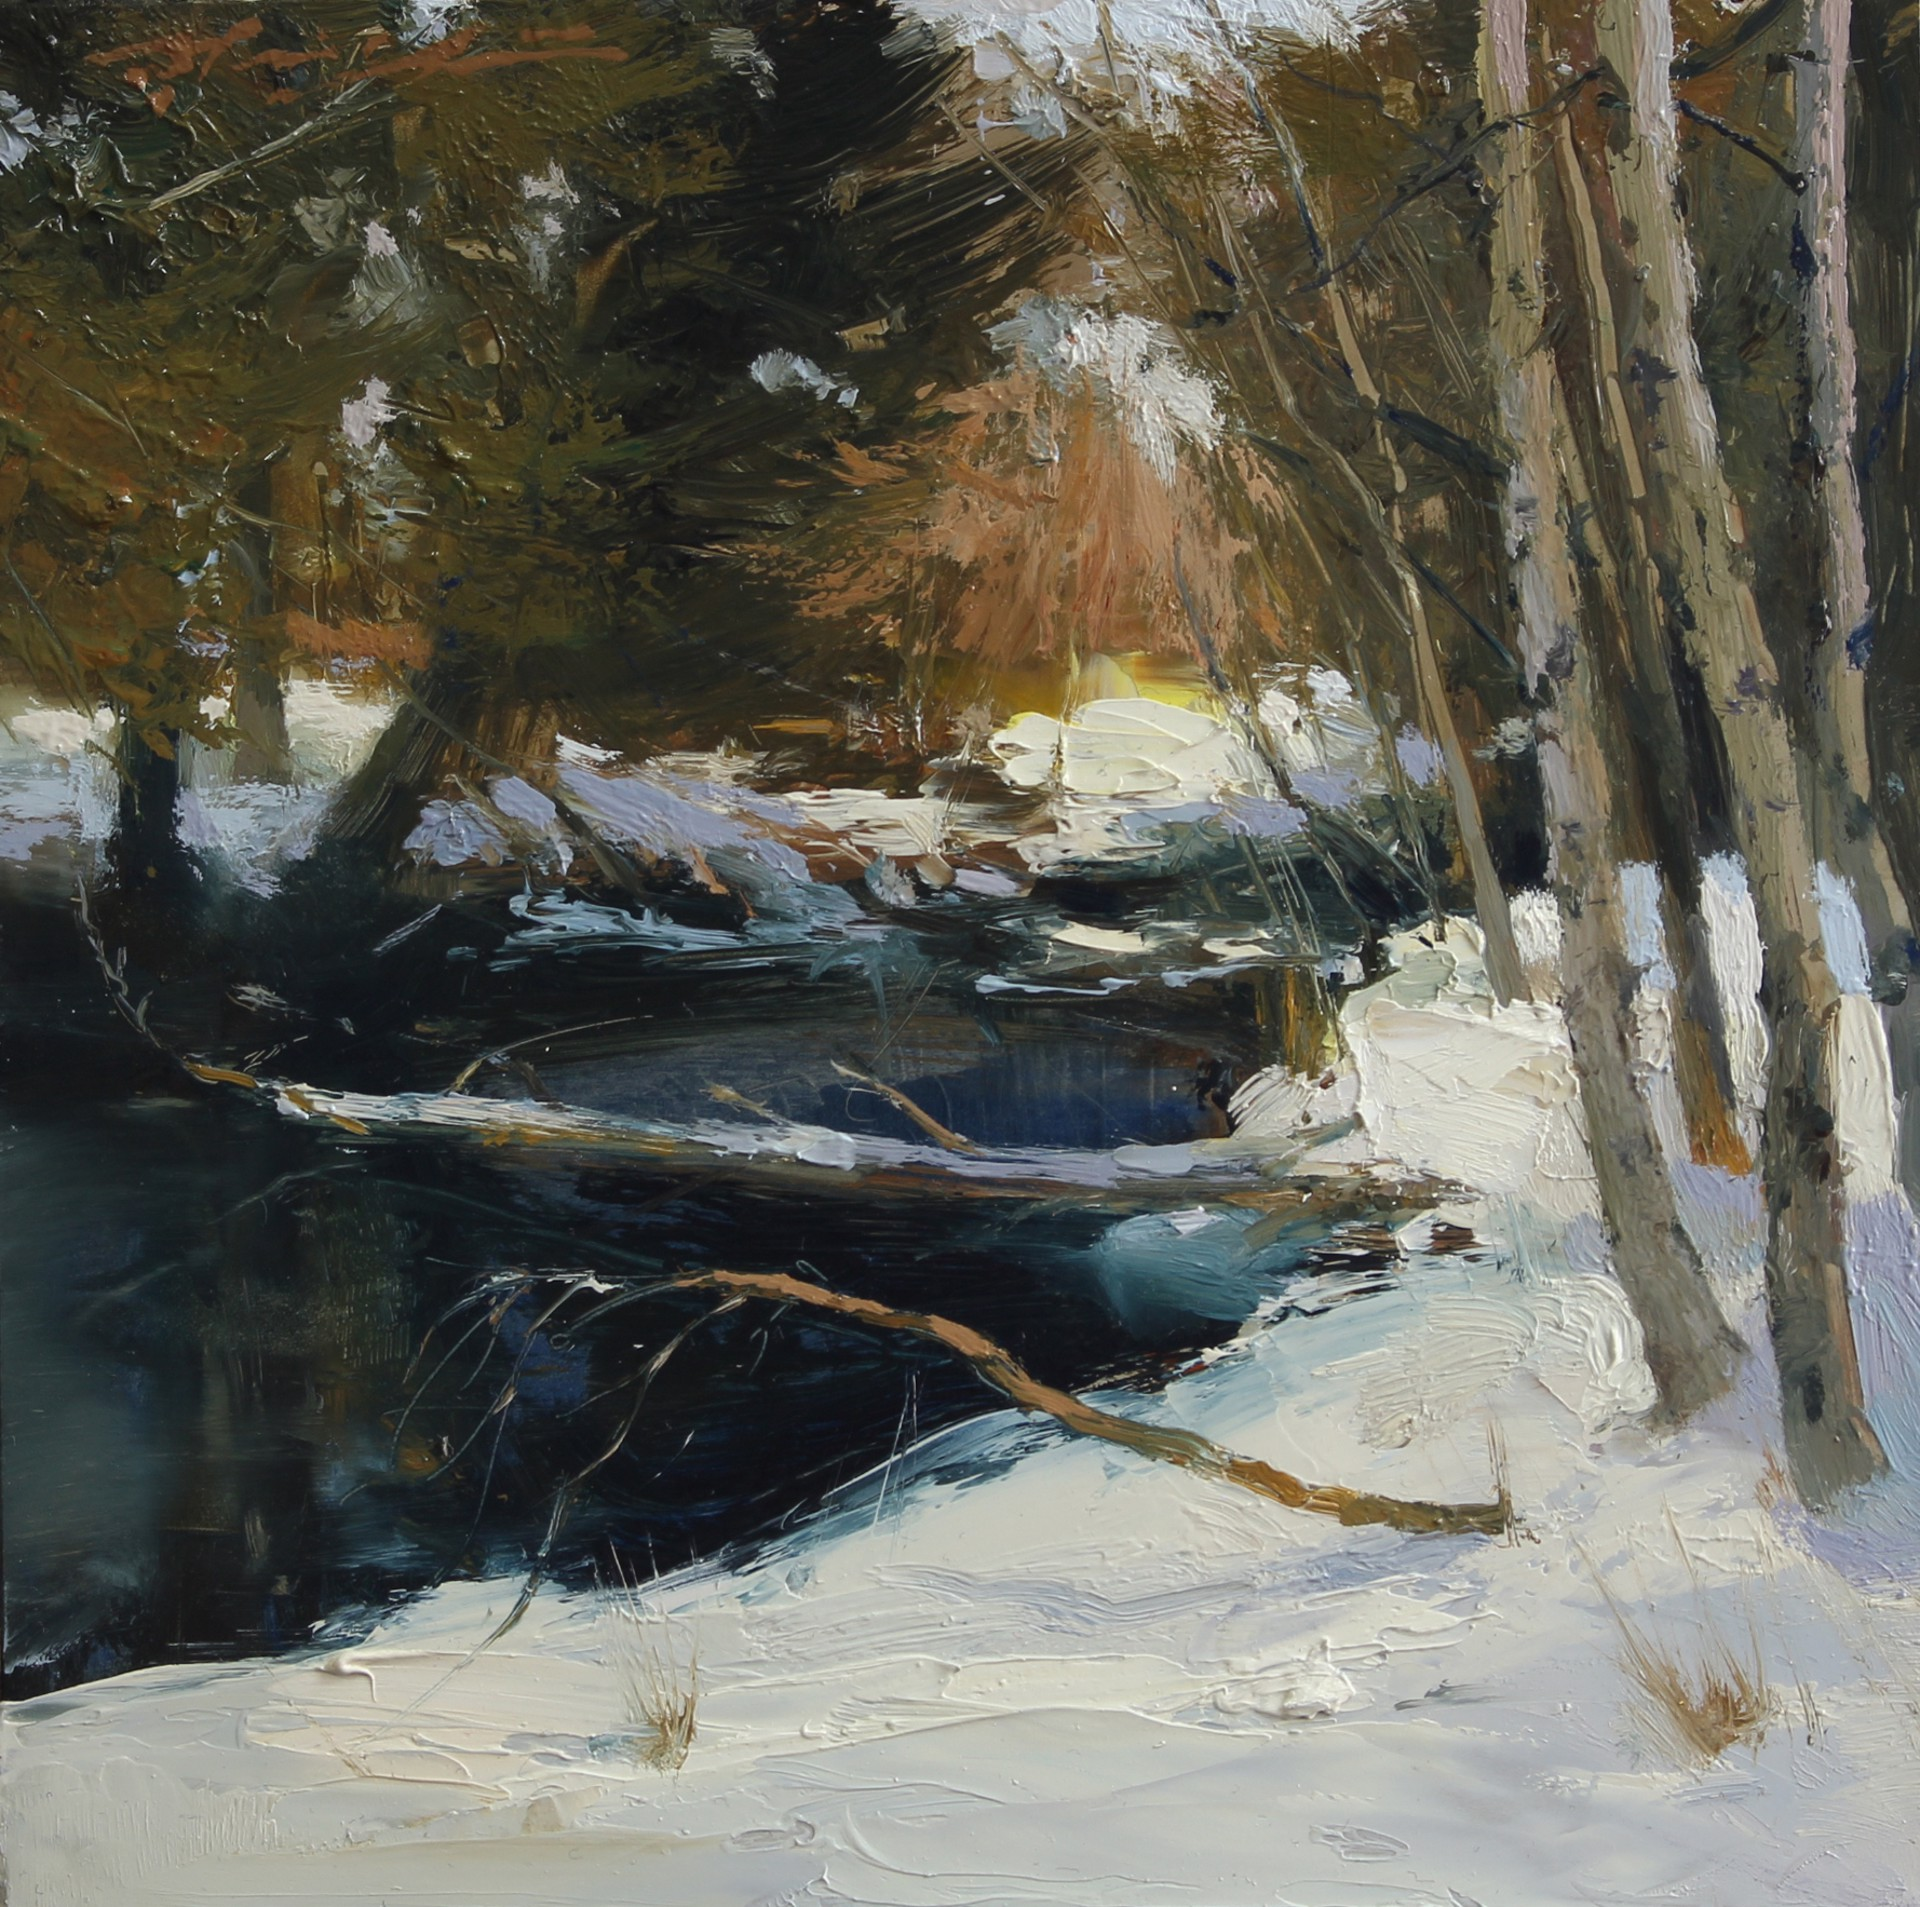 June Lake Snow by Hsin-Yao Tseng